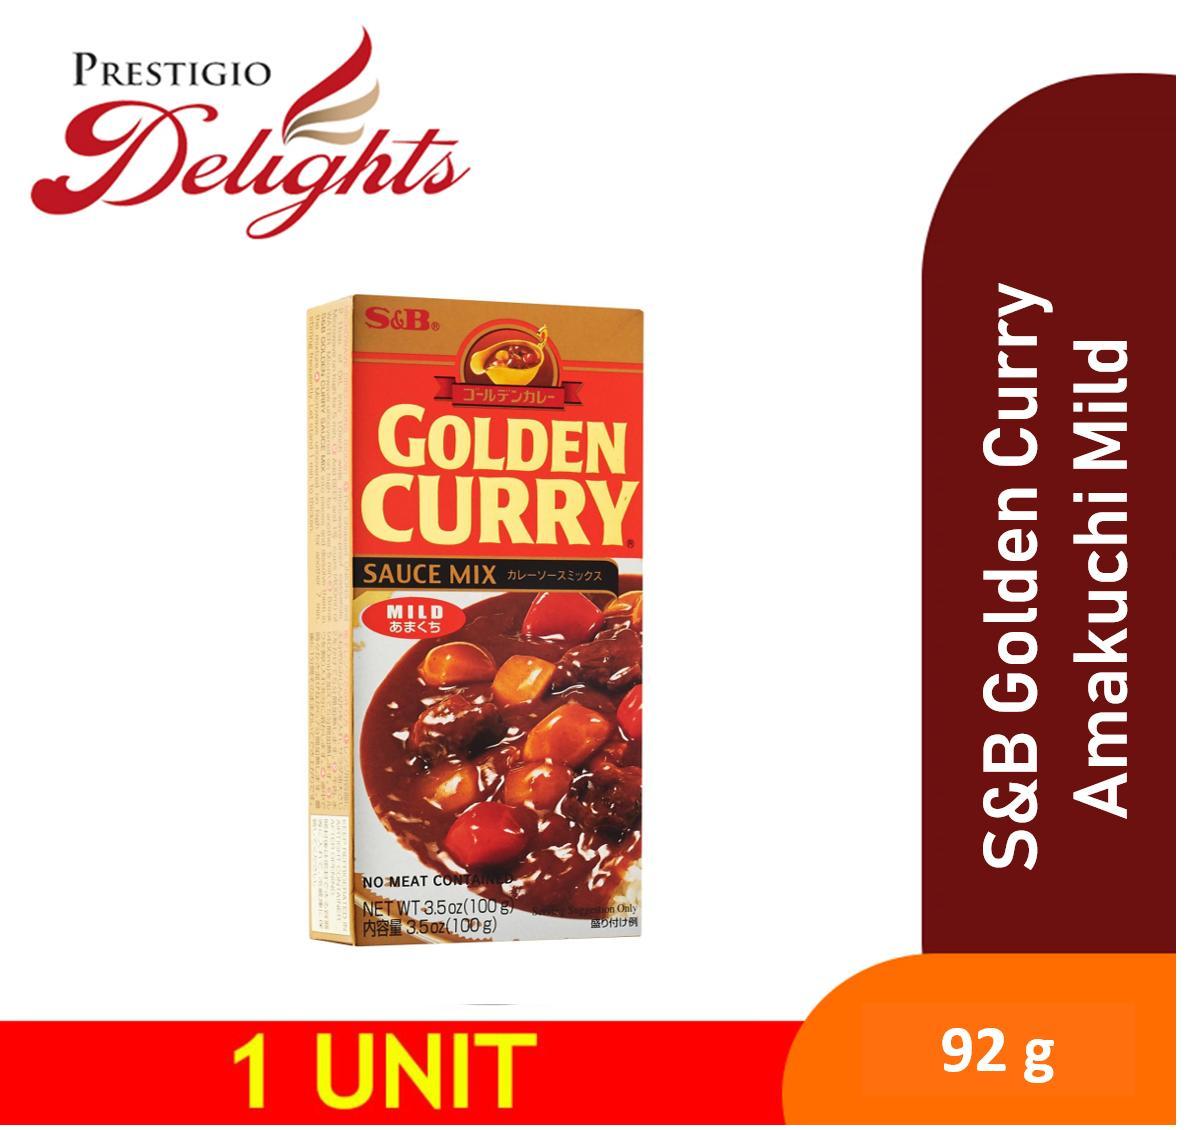 S&b Golden Curry Amakuchi Mild Instant Curry 92g By Prestigio Delights.